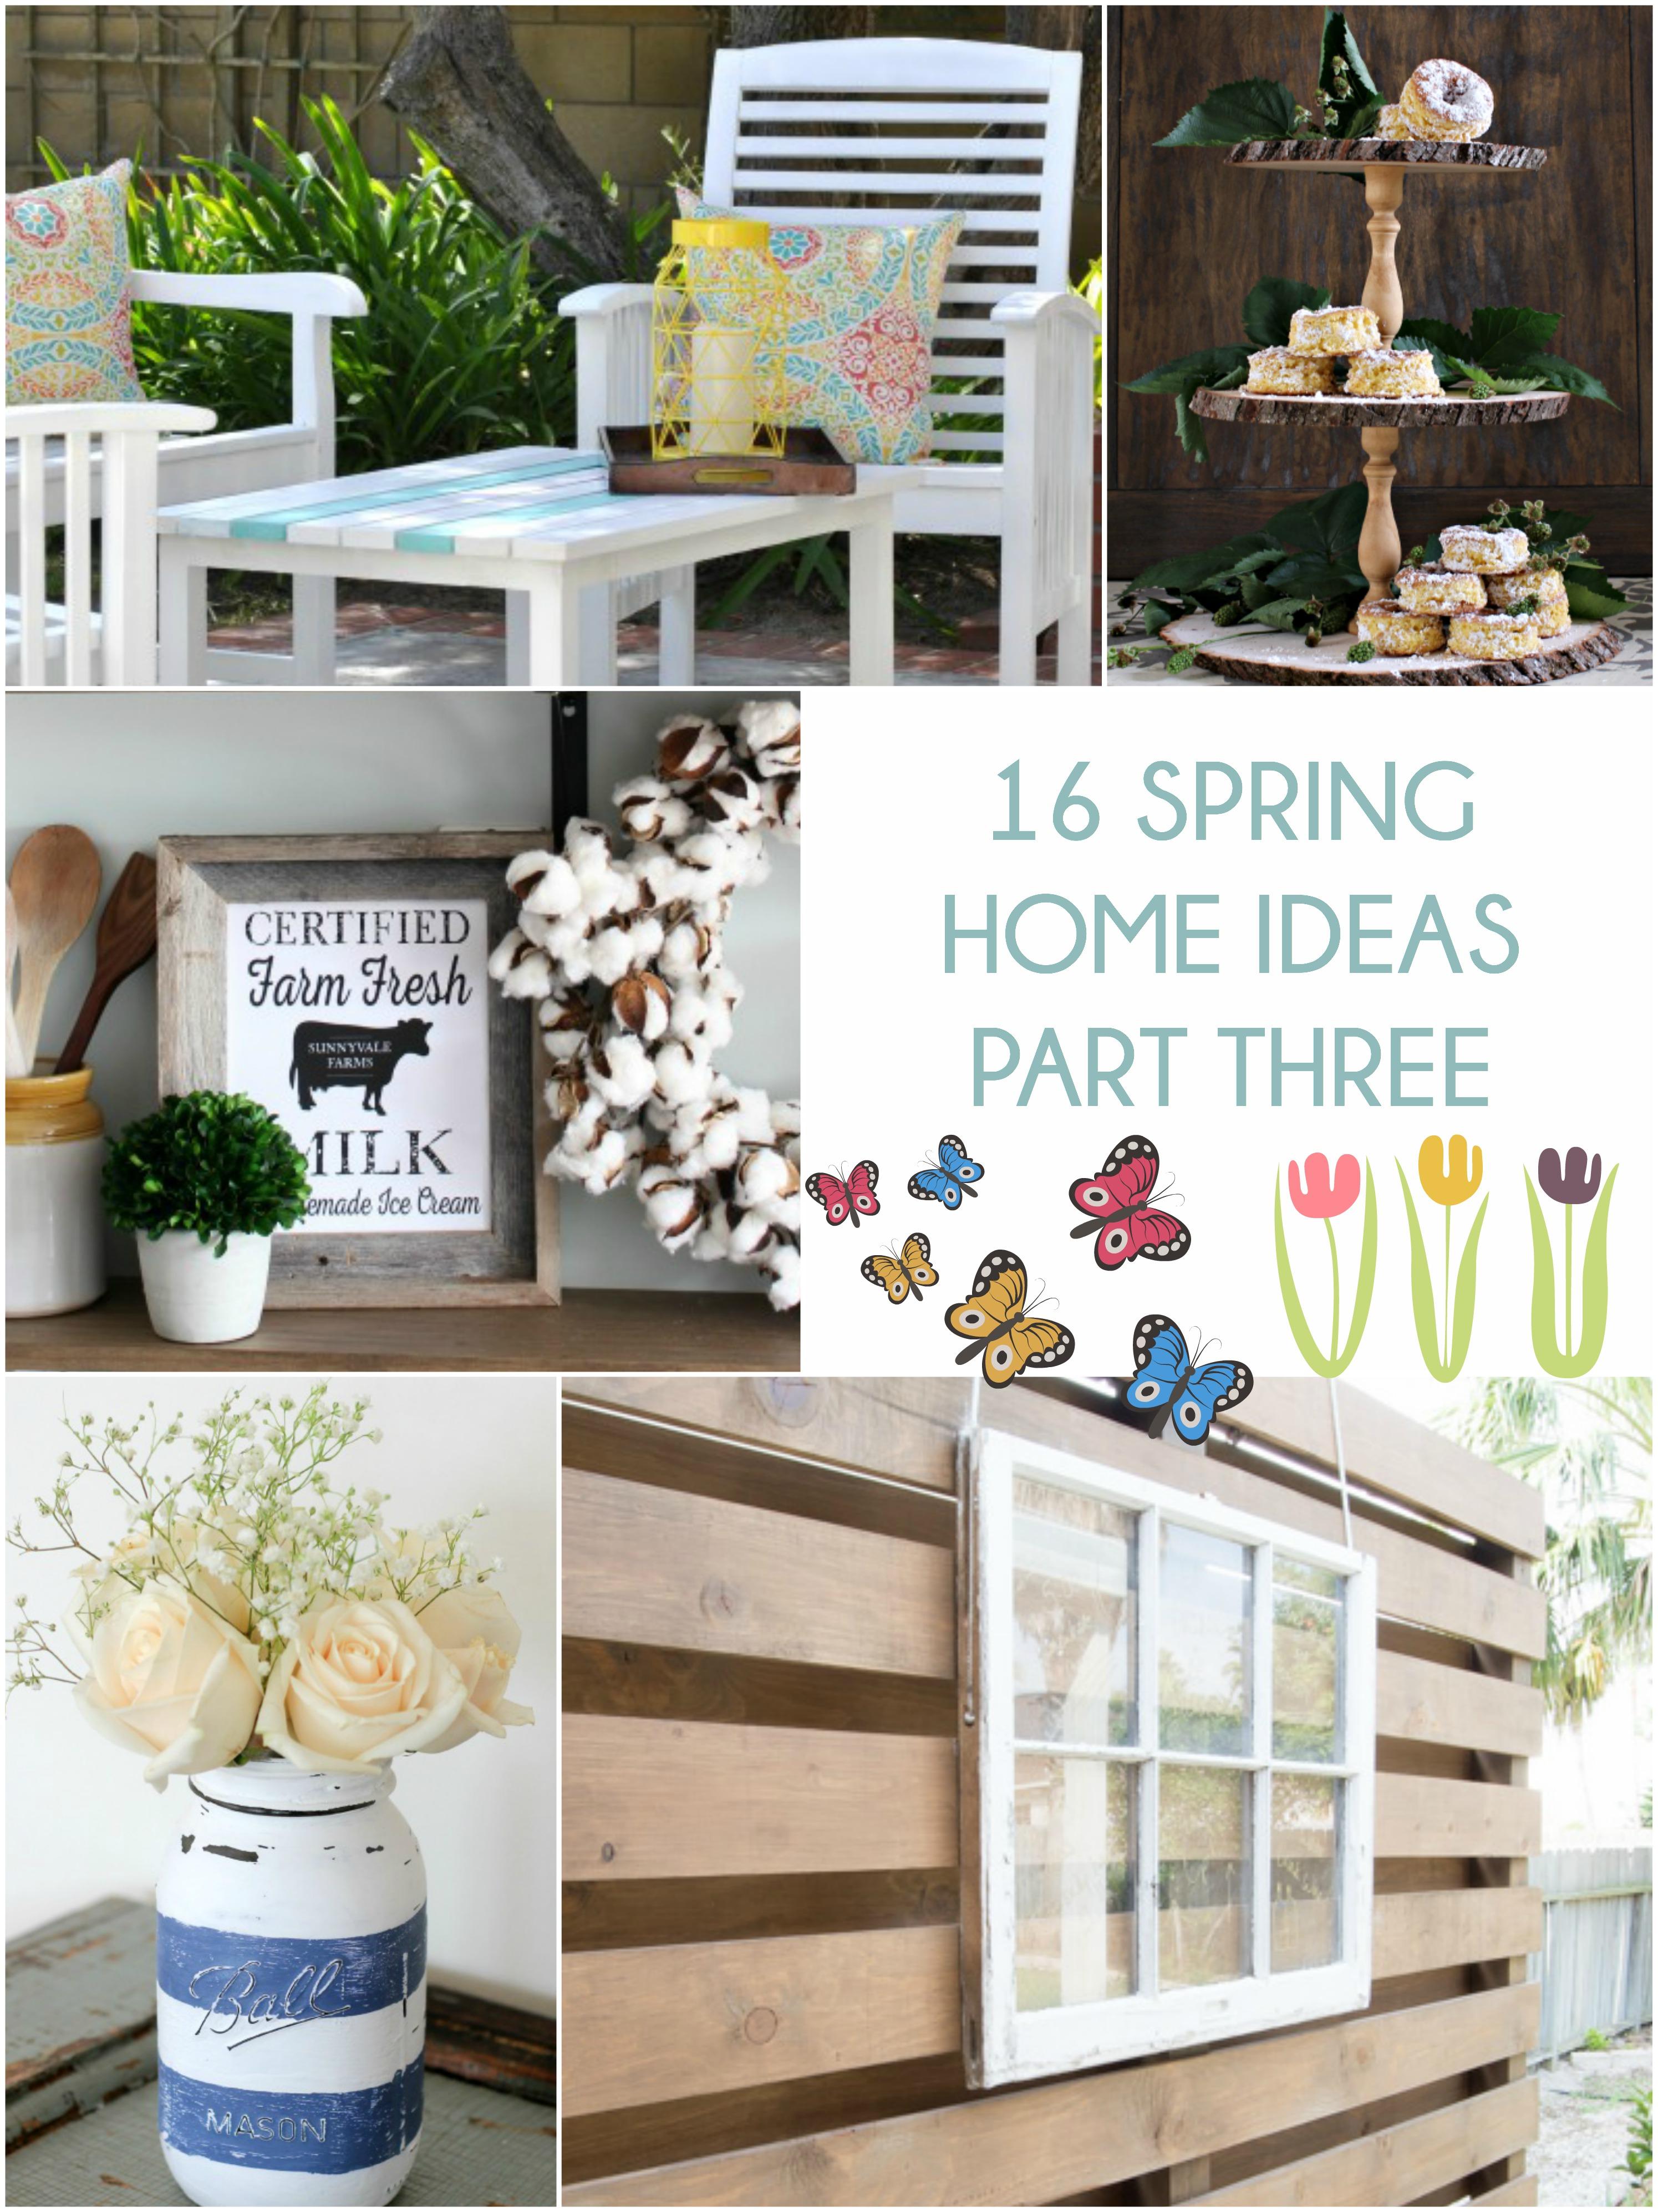 16 Spring Home Ideas Part Three